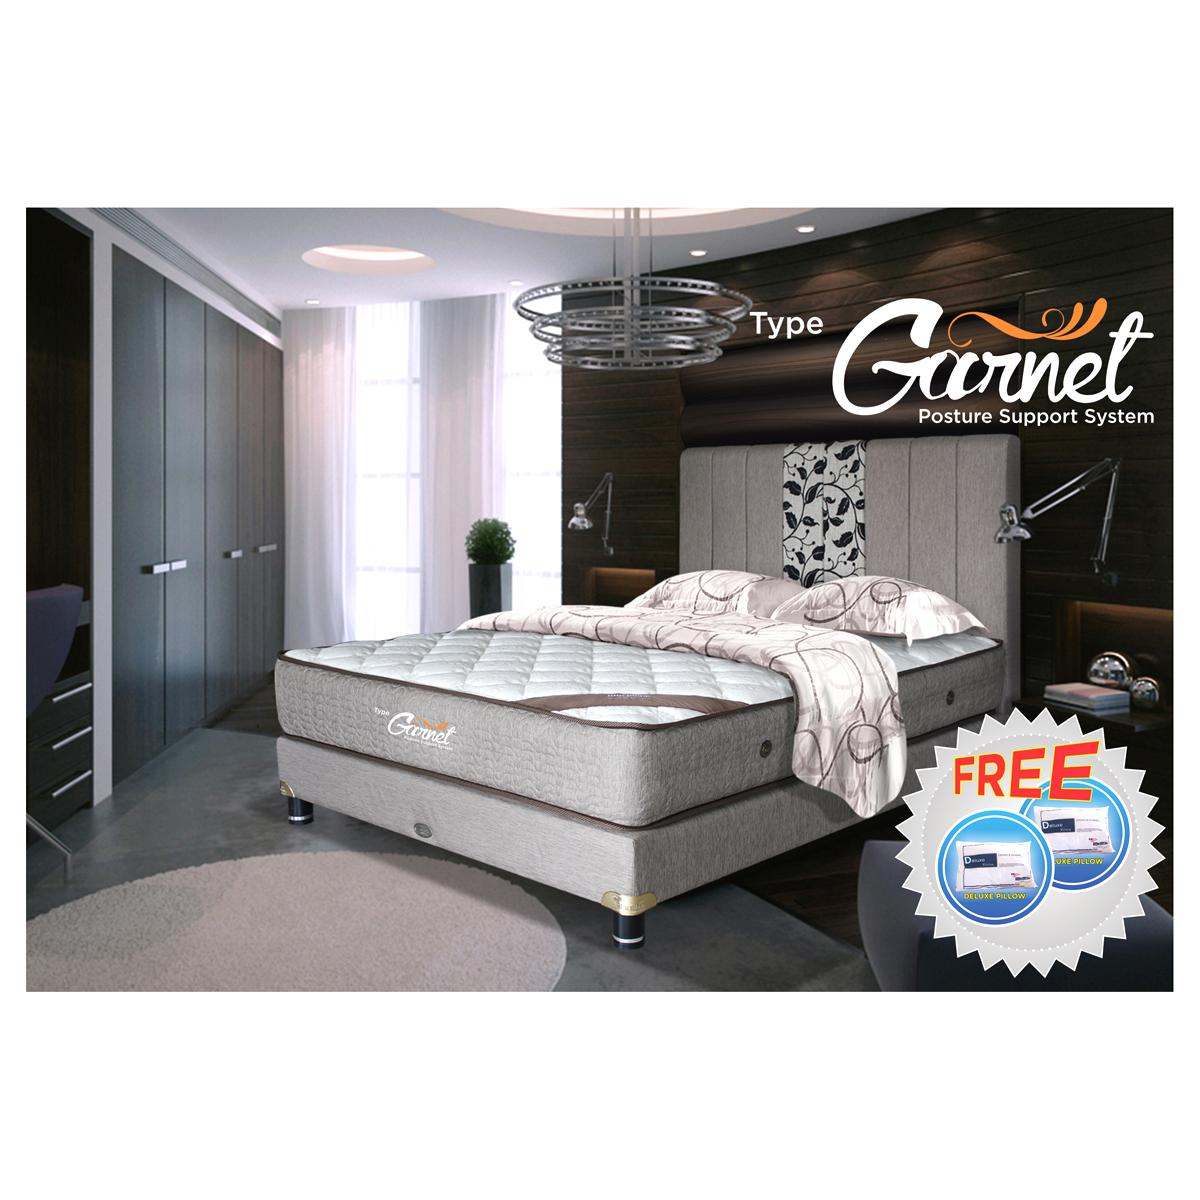 FREE ONGKIR American Pillo Spring Bed GARNET - MATTRESS 100x200